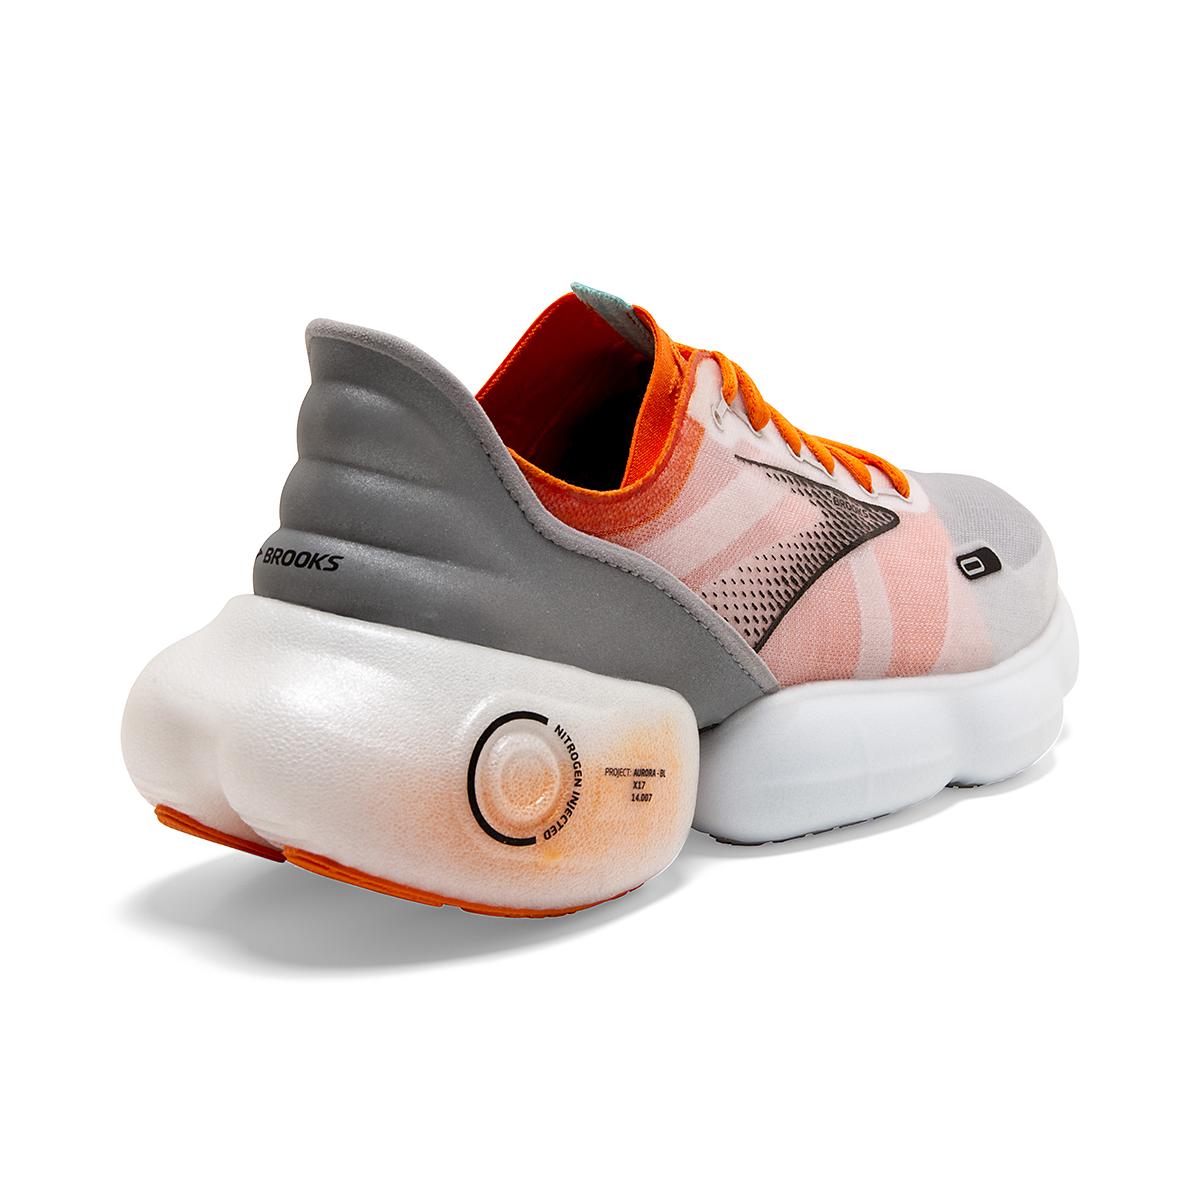 Men's Brooks Aurora-BL Running Shoe - Color: Persimmon/Antarctica - Size: 7 - Width: Regular, Persimmon/Antarctica, large, image 4